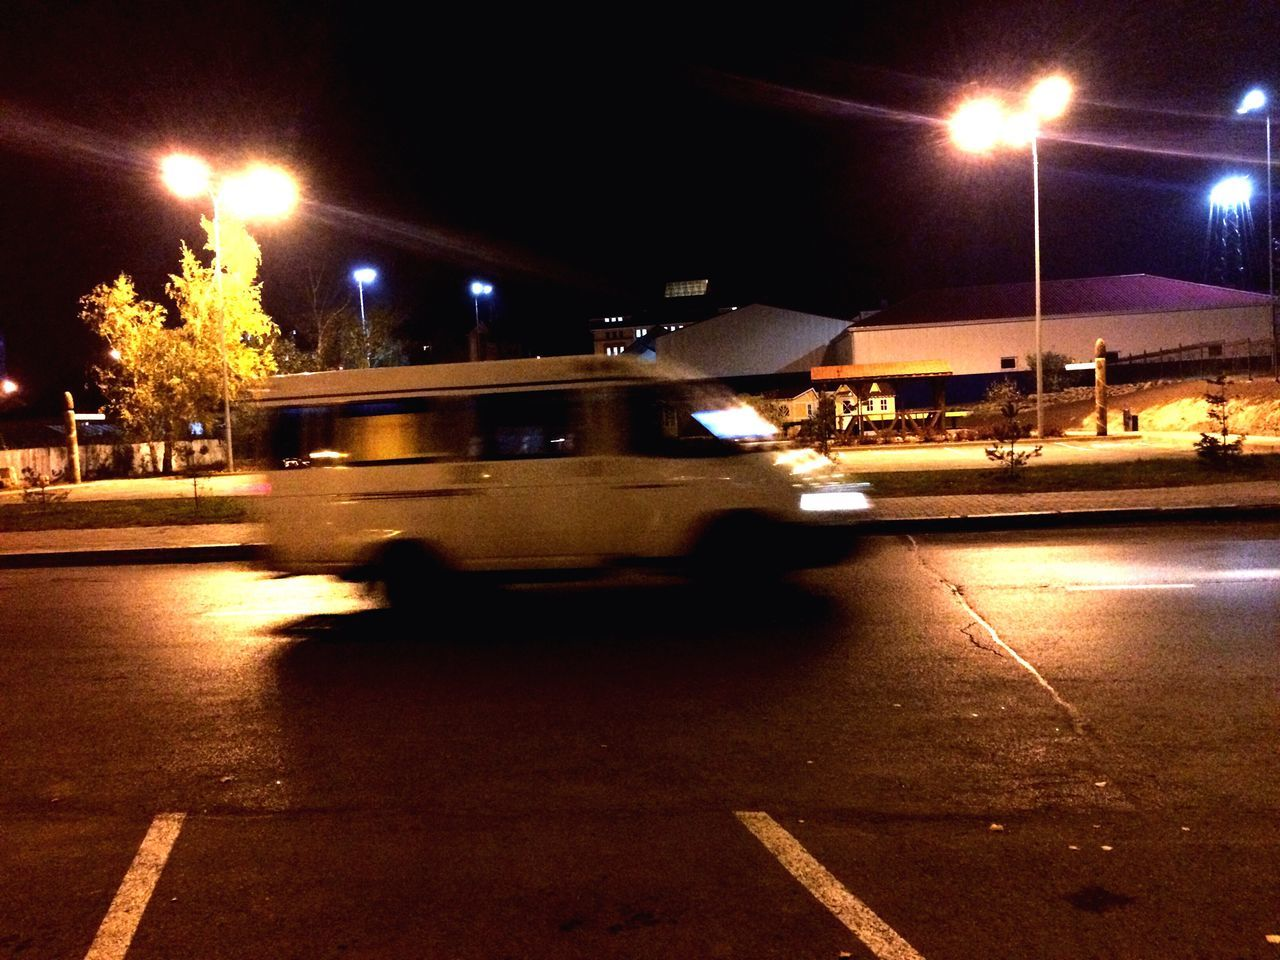 night, illuminated, blurred motion, transportation, lighting equipment, road, speed, land vehicle, street, mode of transport, street light, motion, outdoors, no people, city, sky